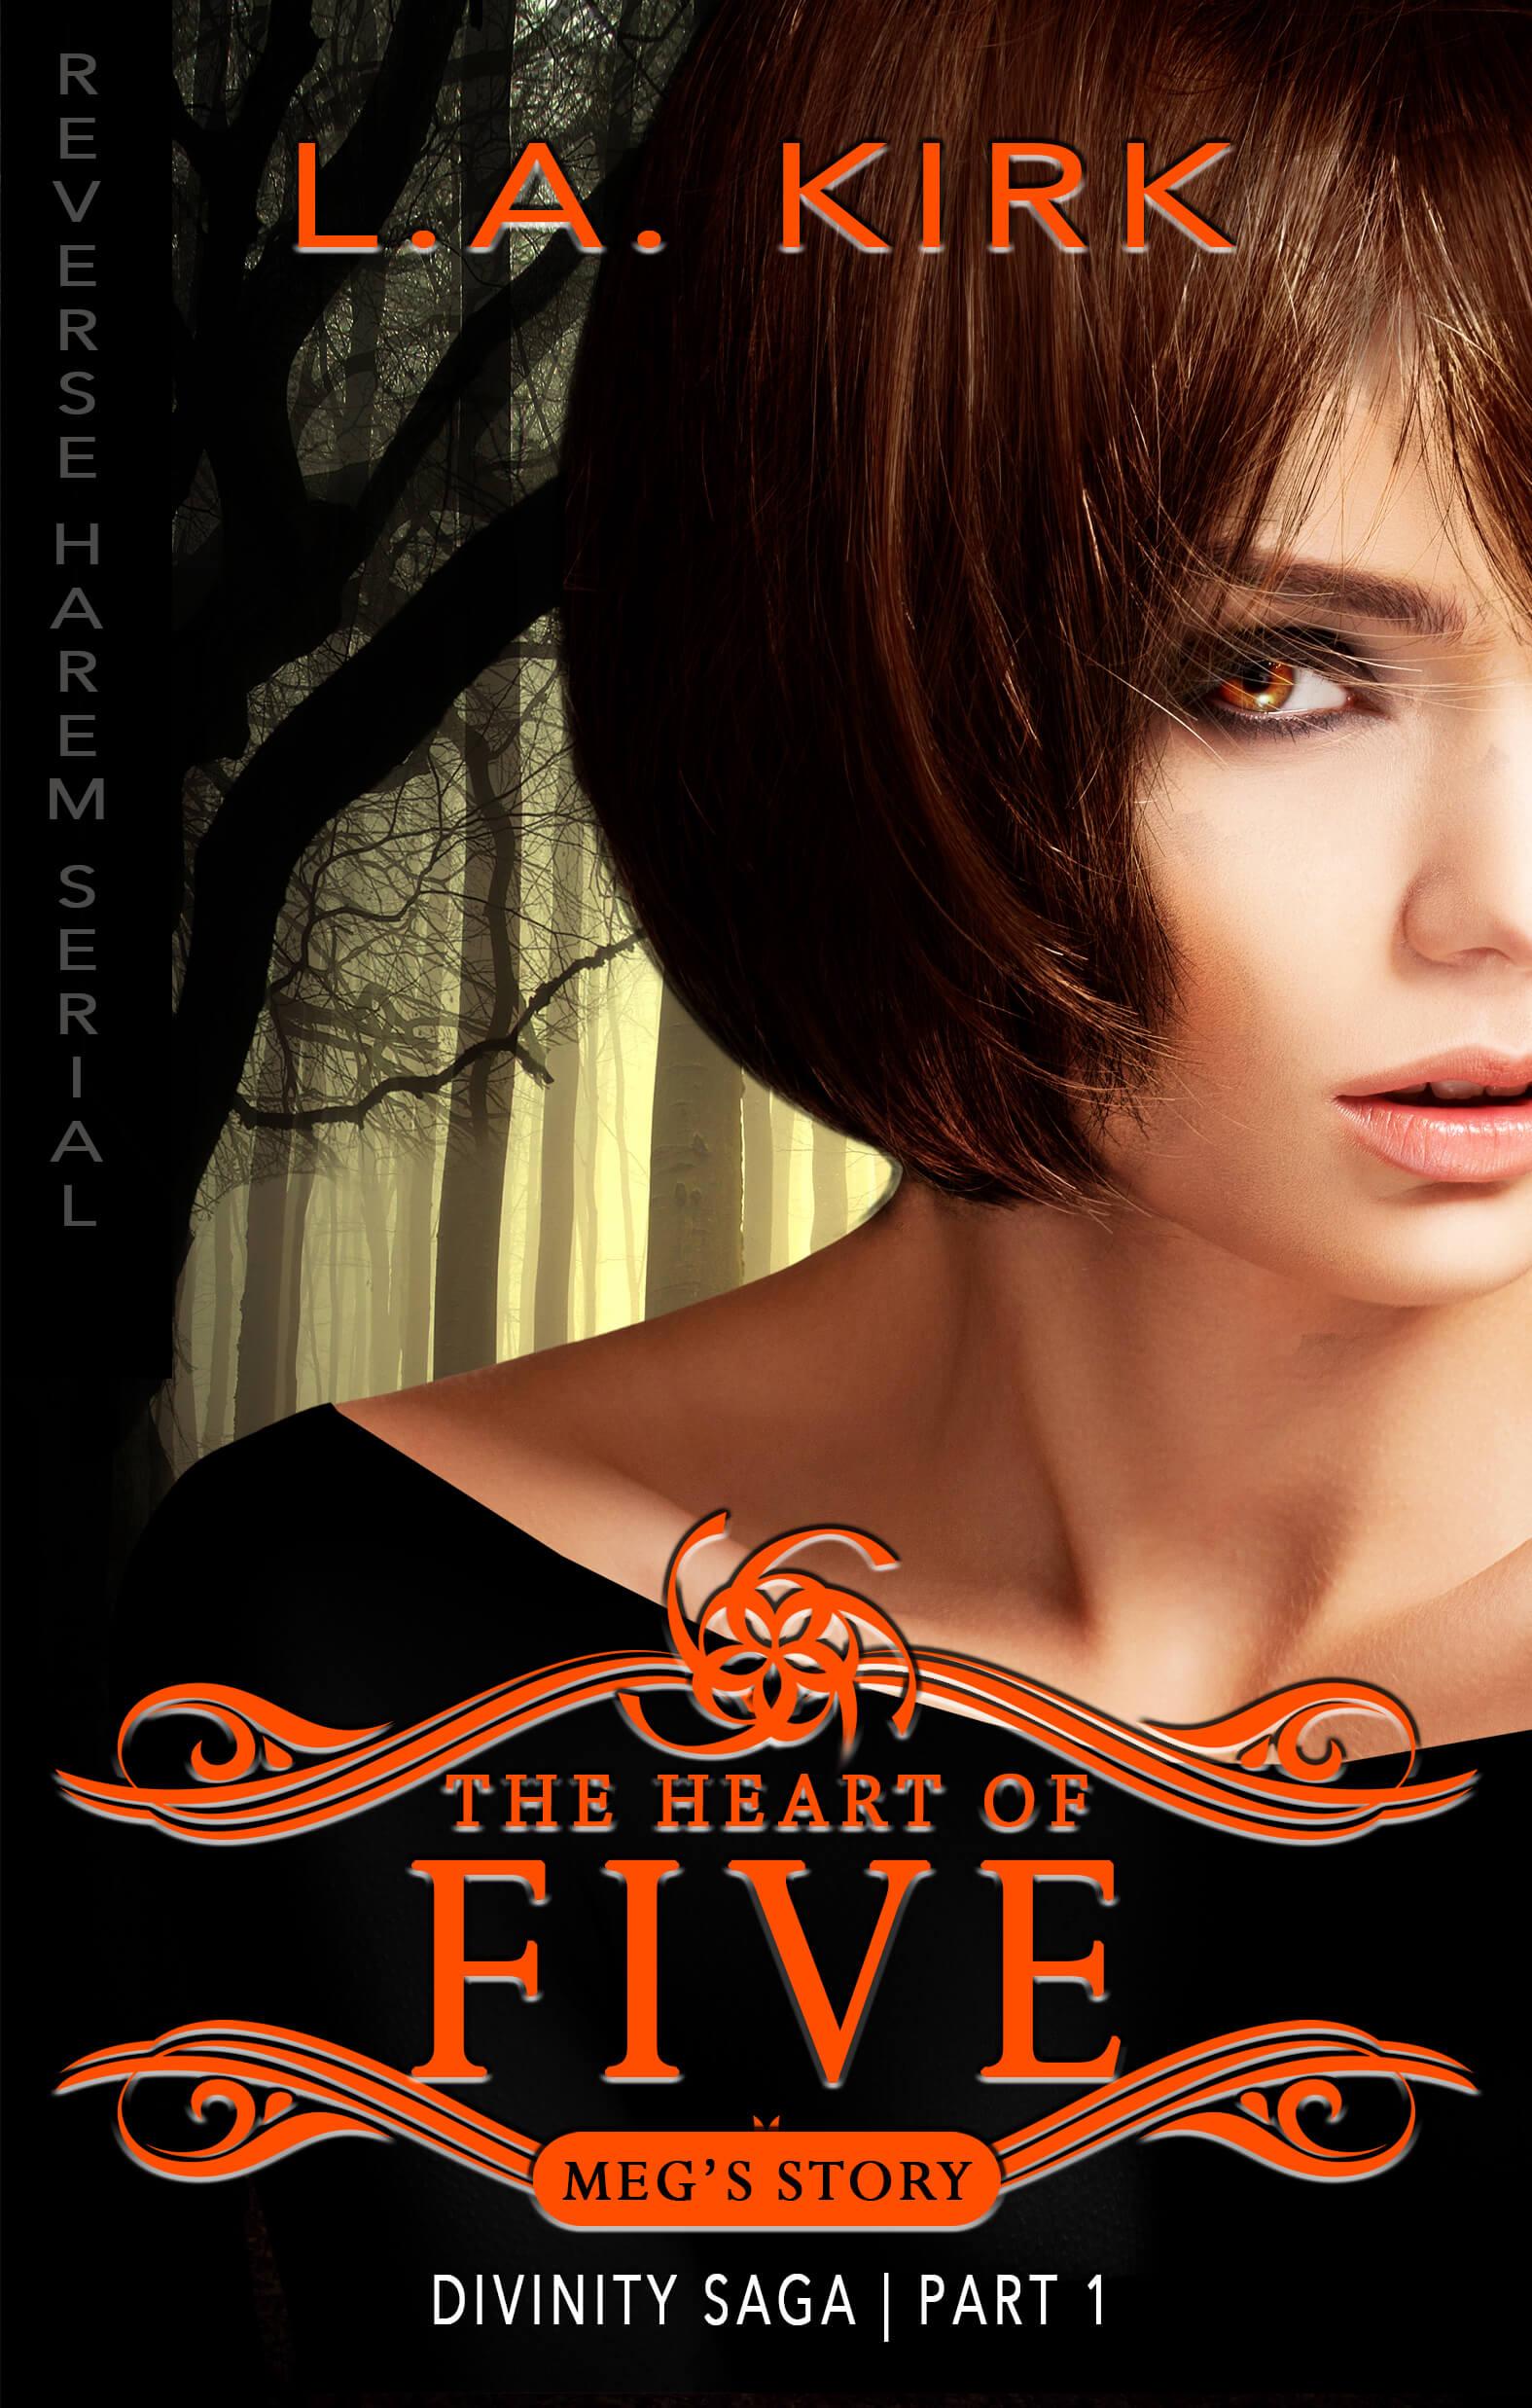 Heart of Five